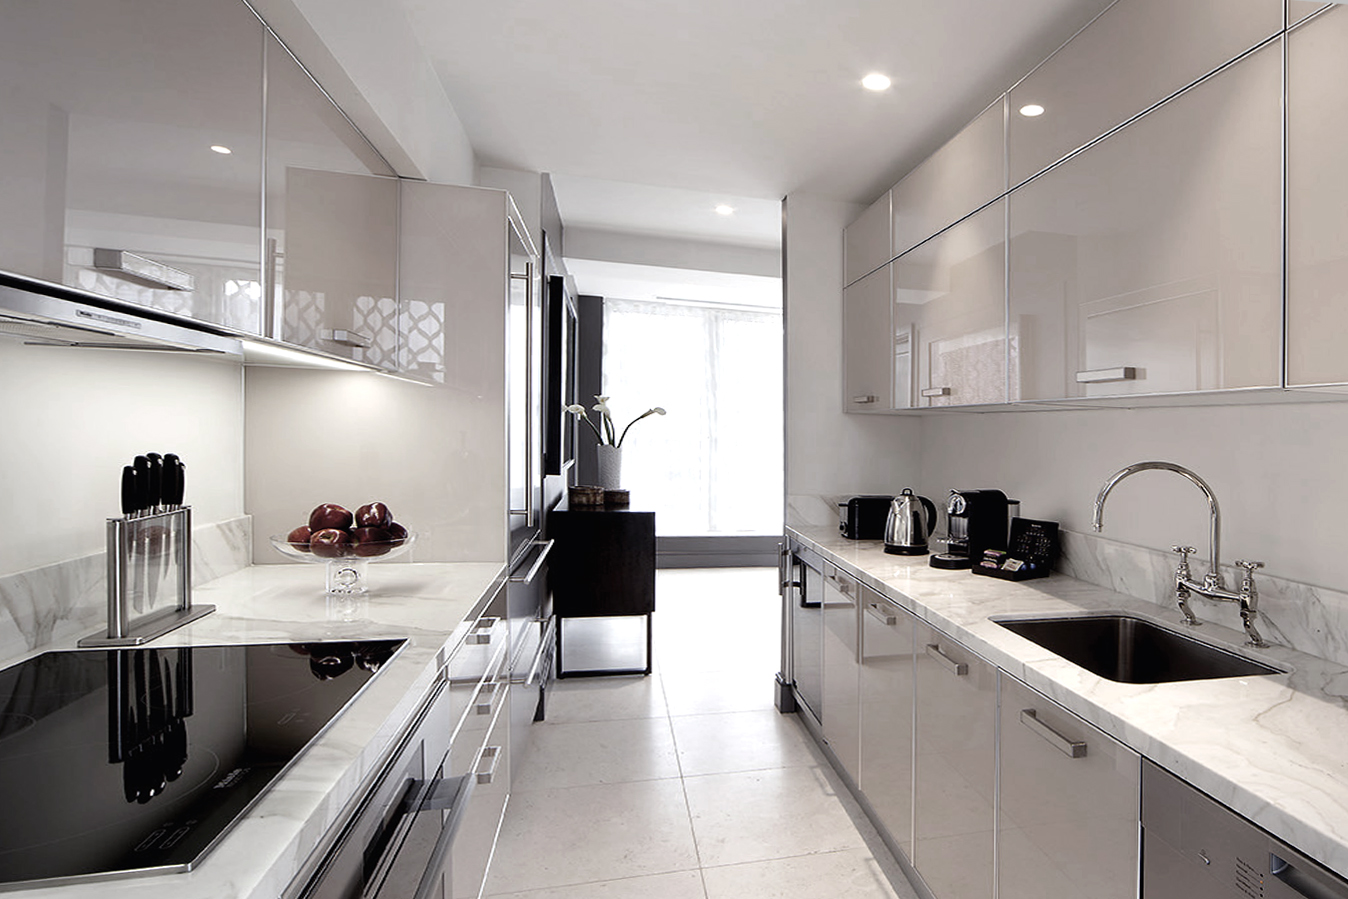 Residential Interior Design in Westport & Greenwich, CT | Joe Ginsberg Design